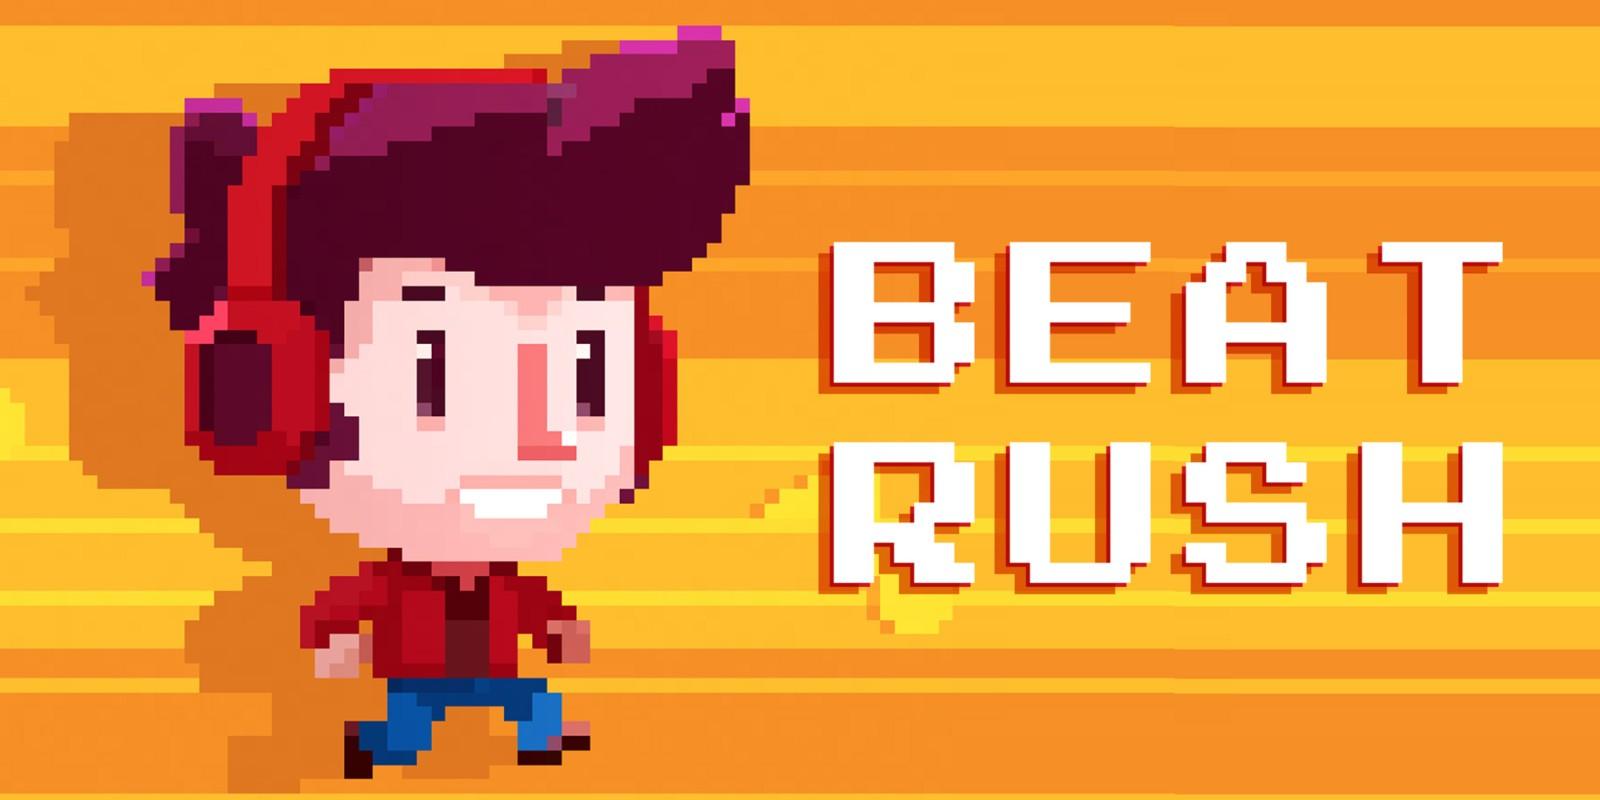 beat rush nintendo switch download software games